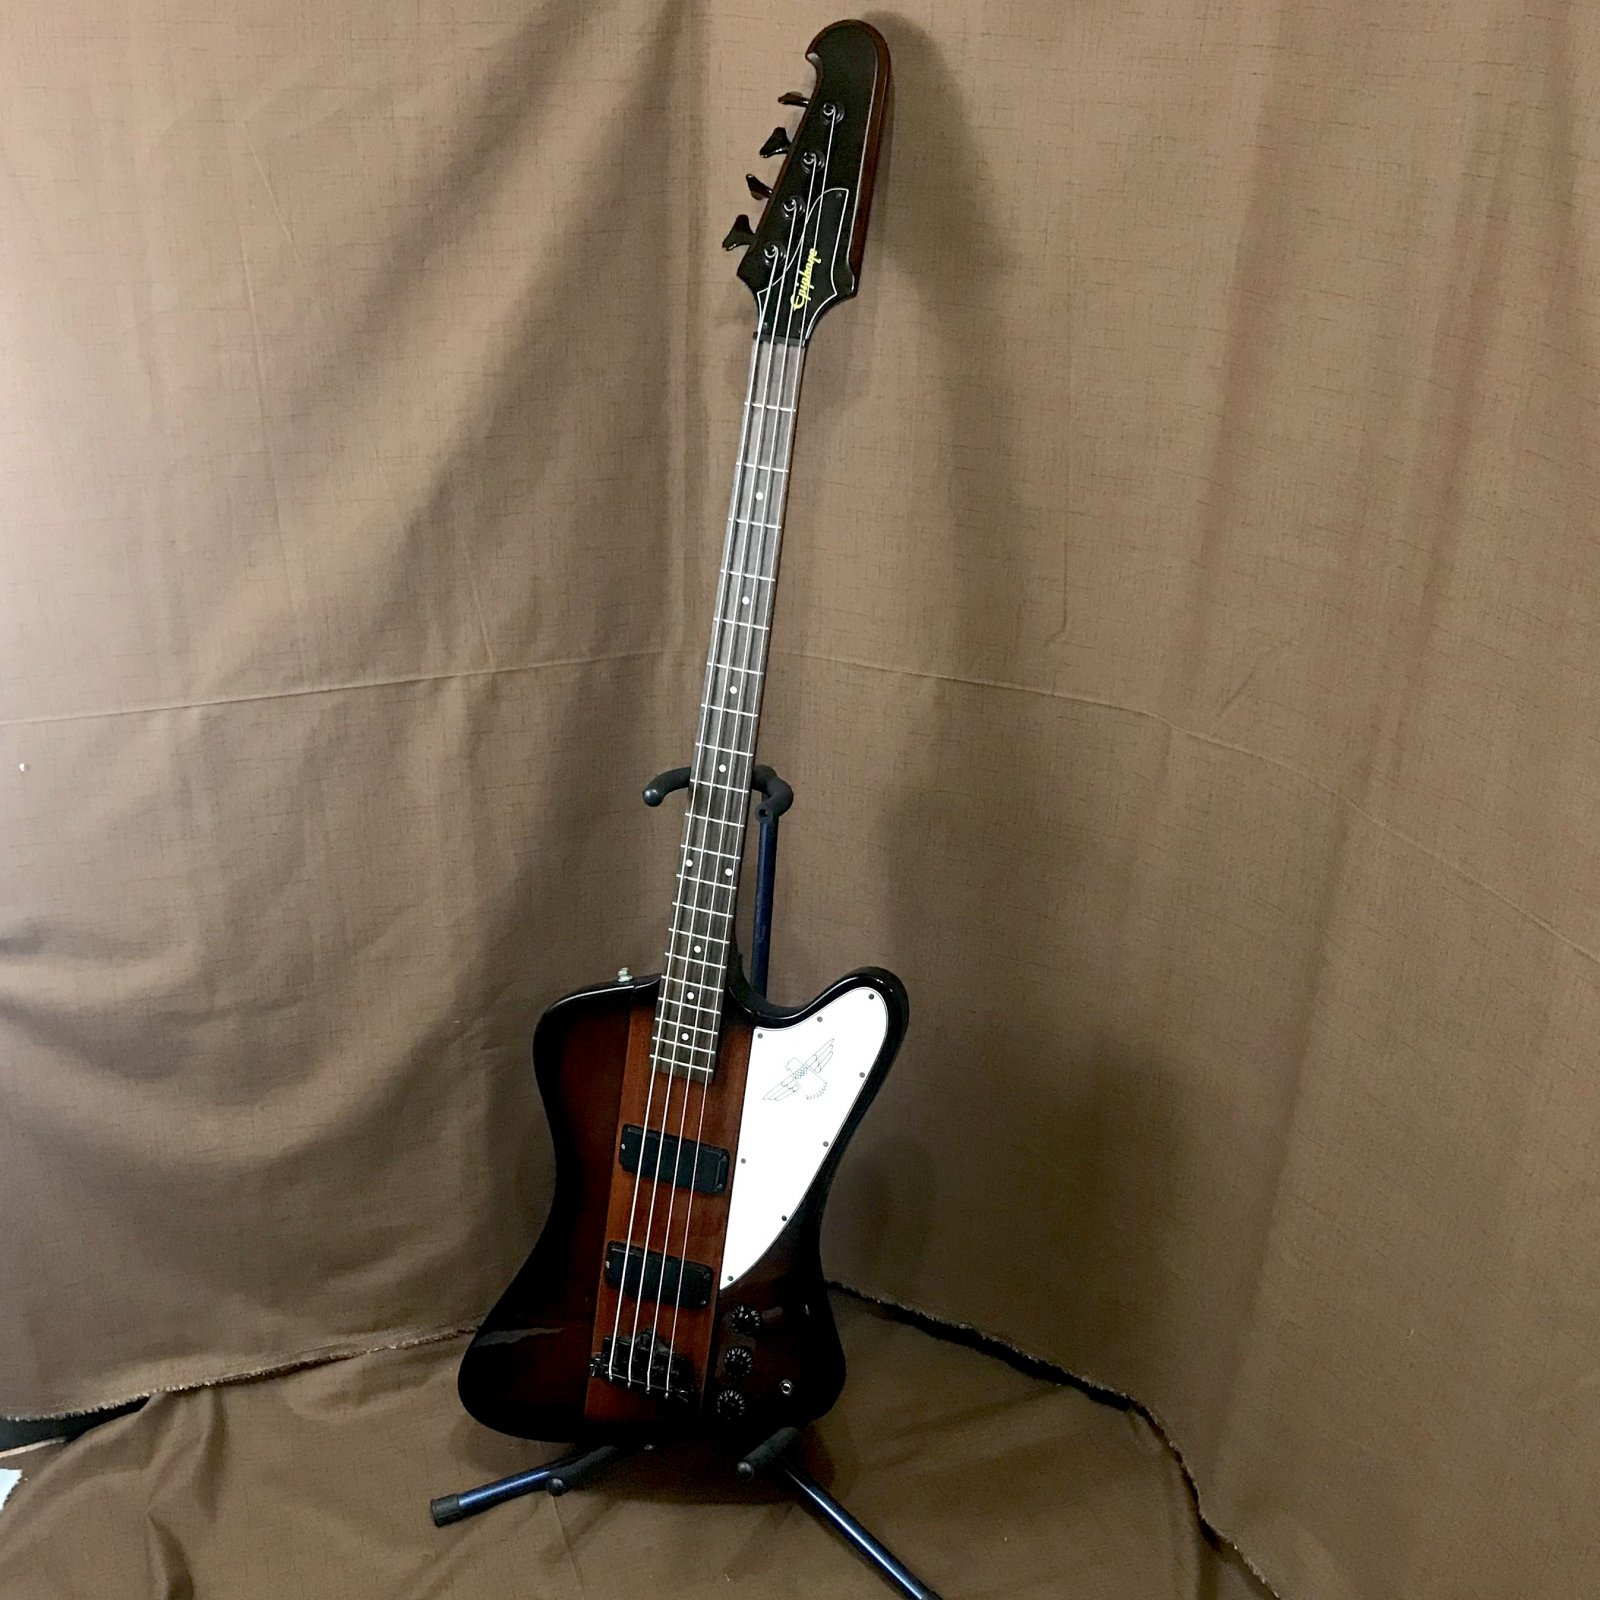 Epiphone Thunderbird Bass Guitar USED w/ Case